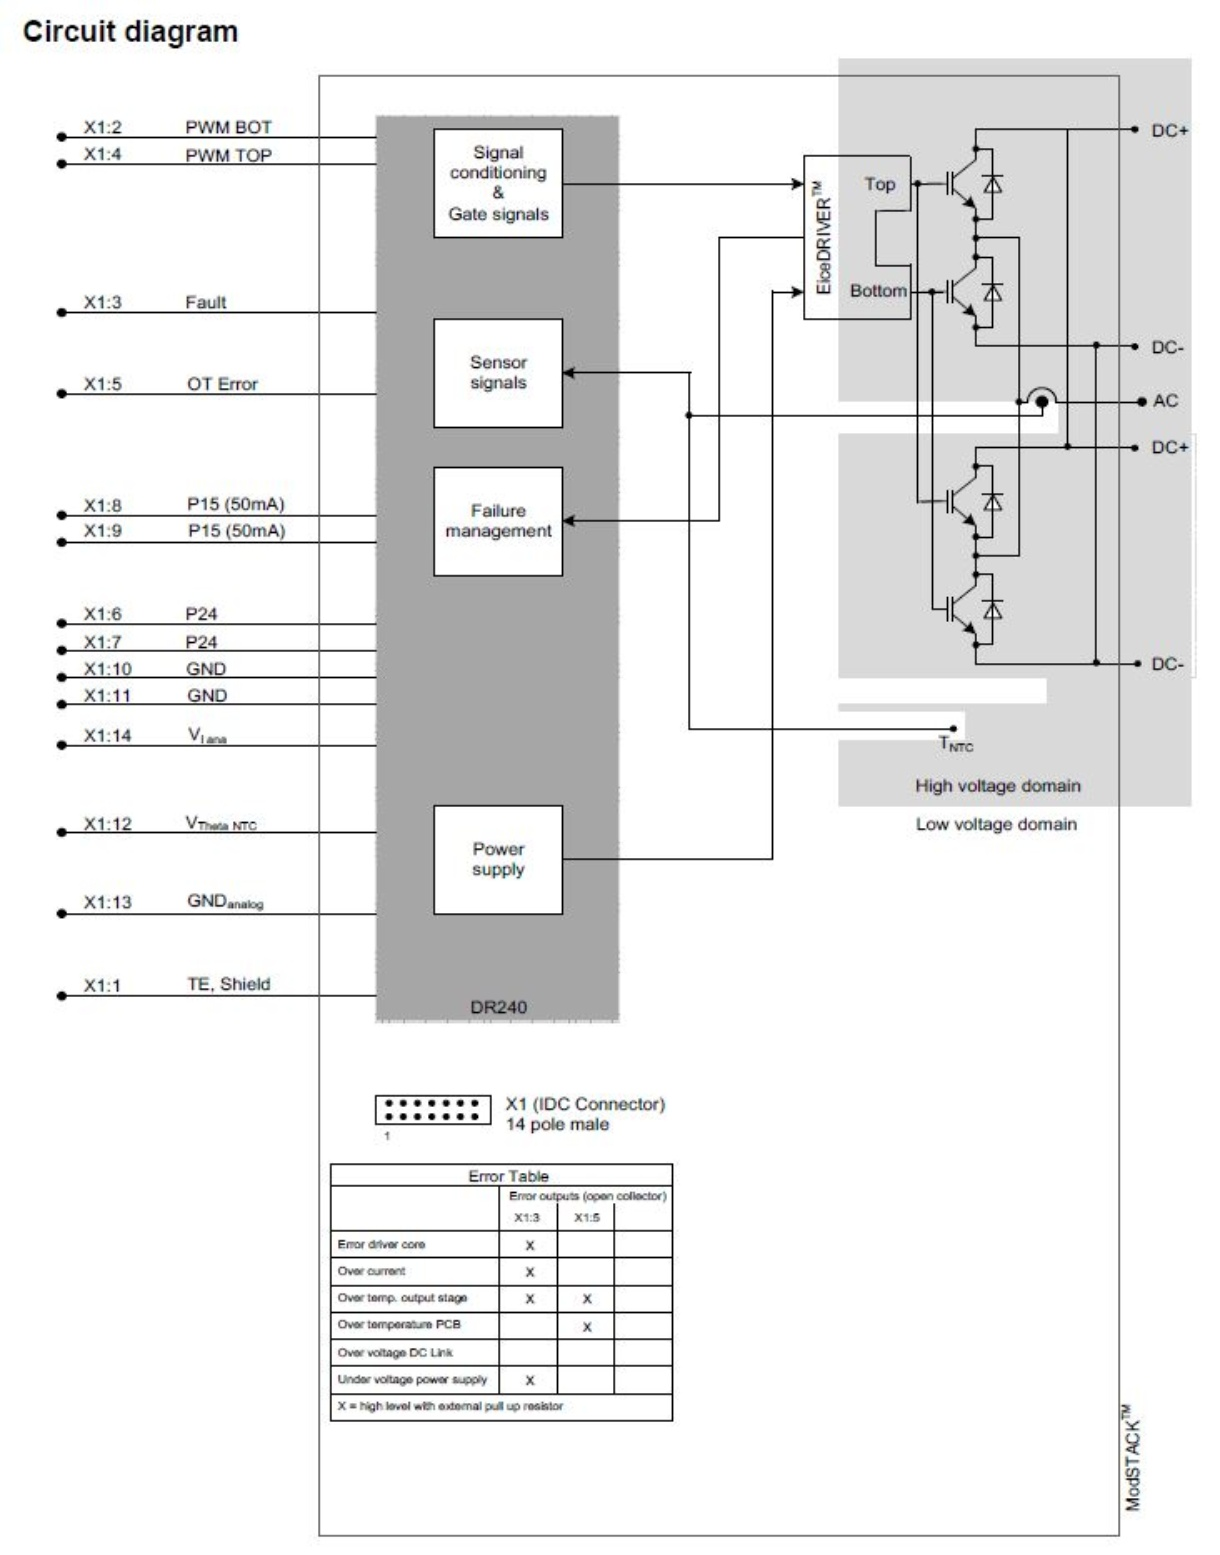 2ls20017e42w36702 Infineon Technologies Ups Pcb Circuit Diagram Diagrams Prevnext